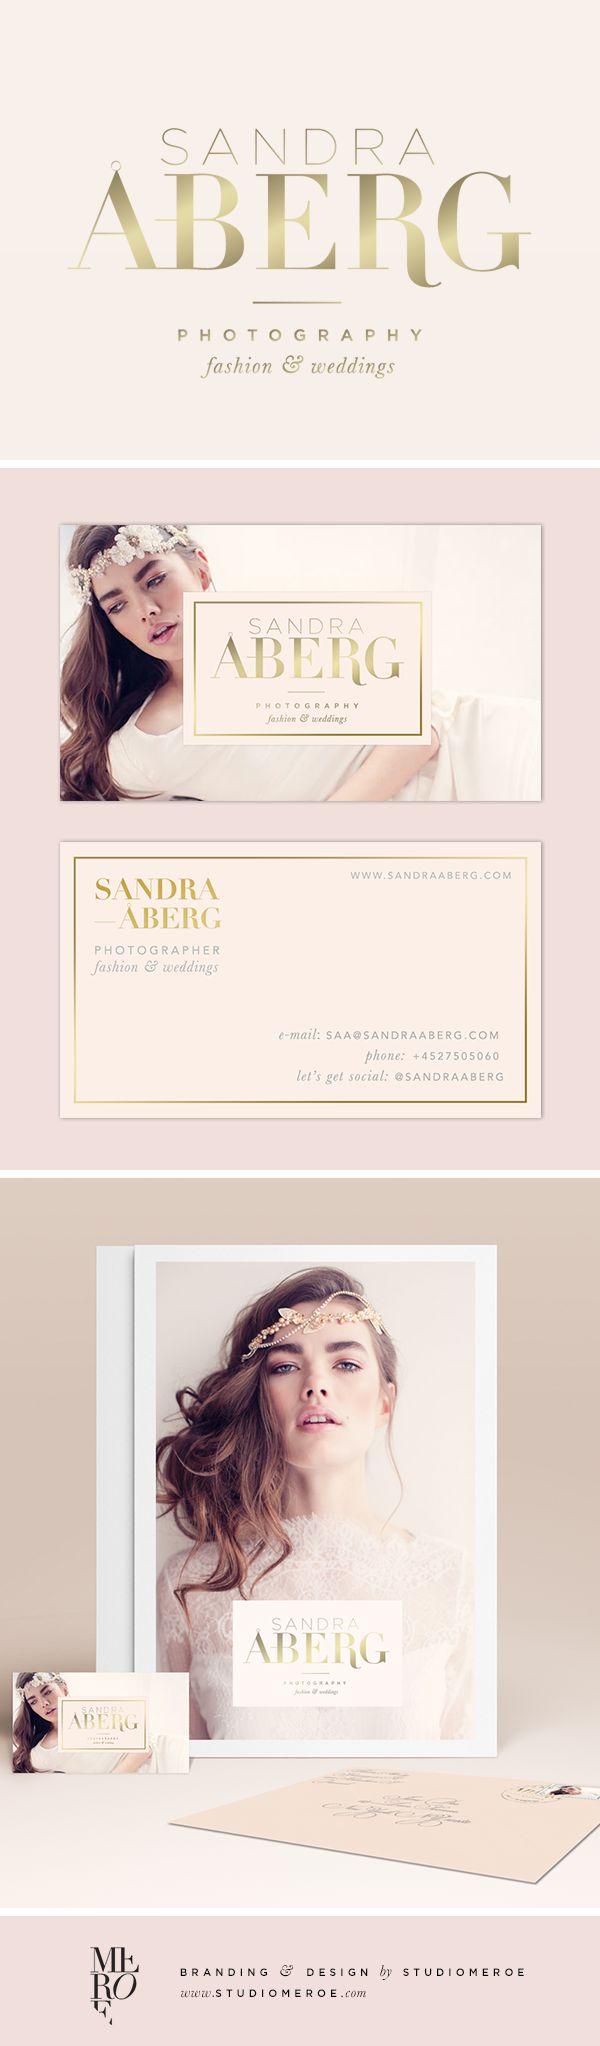 Branding for Sandra Aberg, wedding & fashion photographer. Feminine logo, business card design, and other marketing materials designed by @studiomeroe | Mood: Gold + blush |